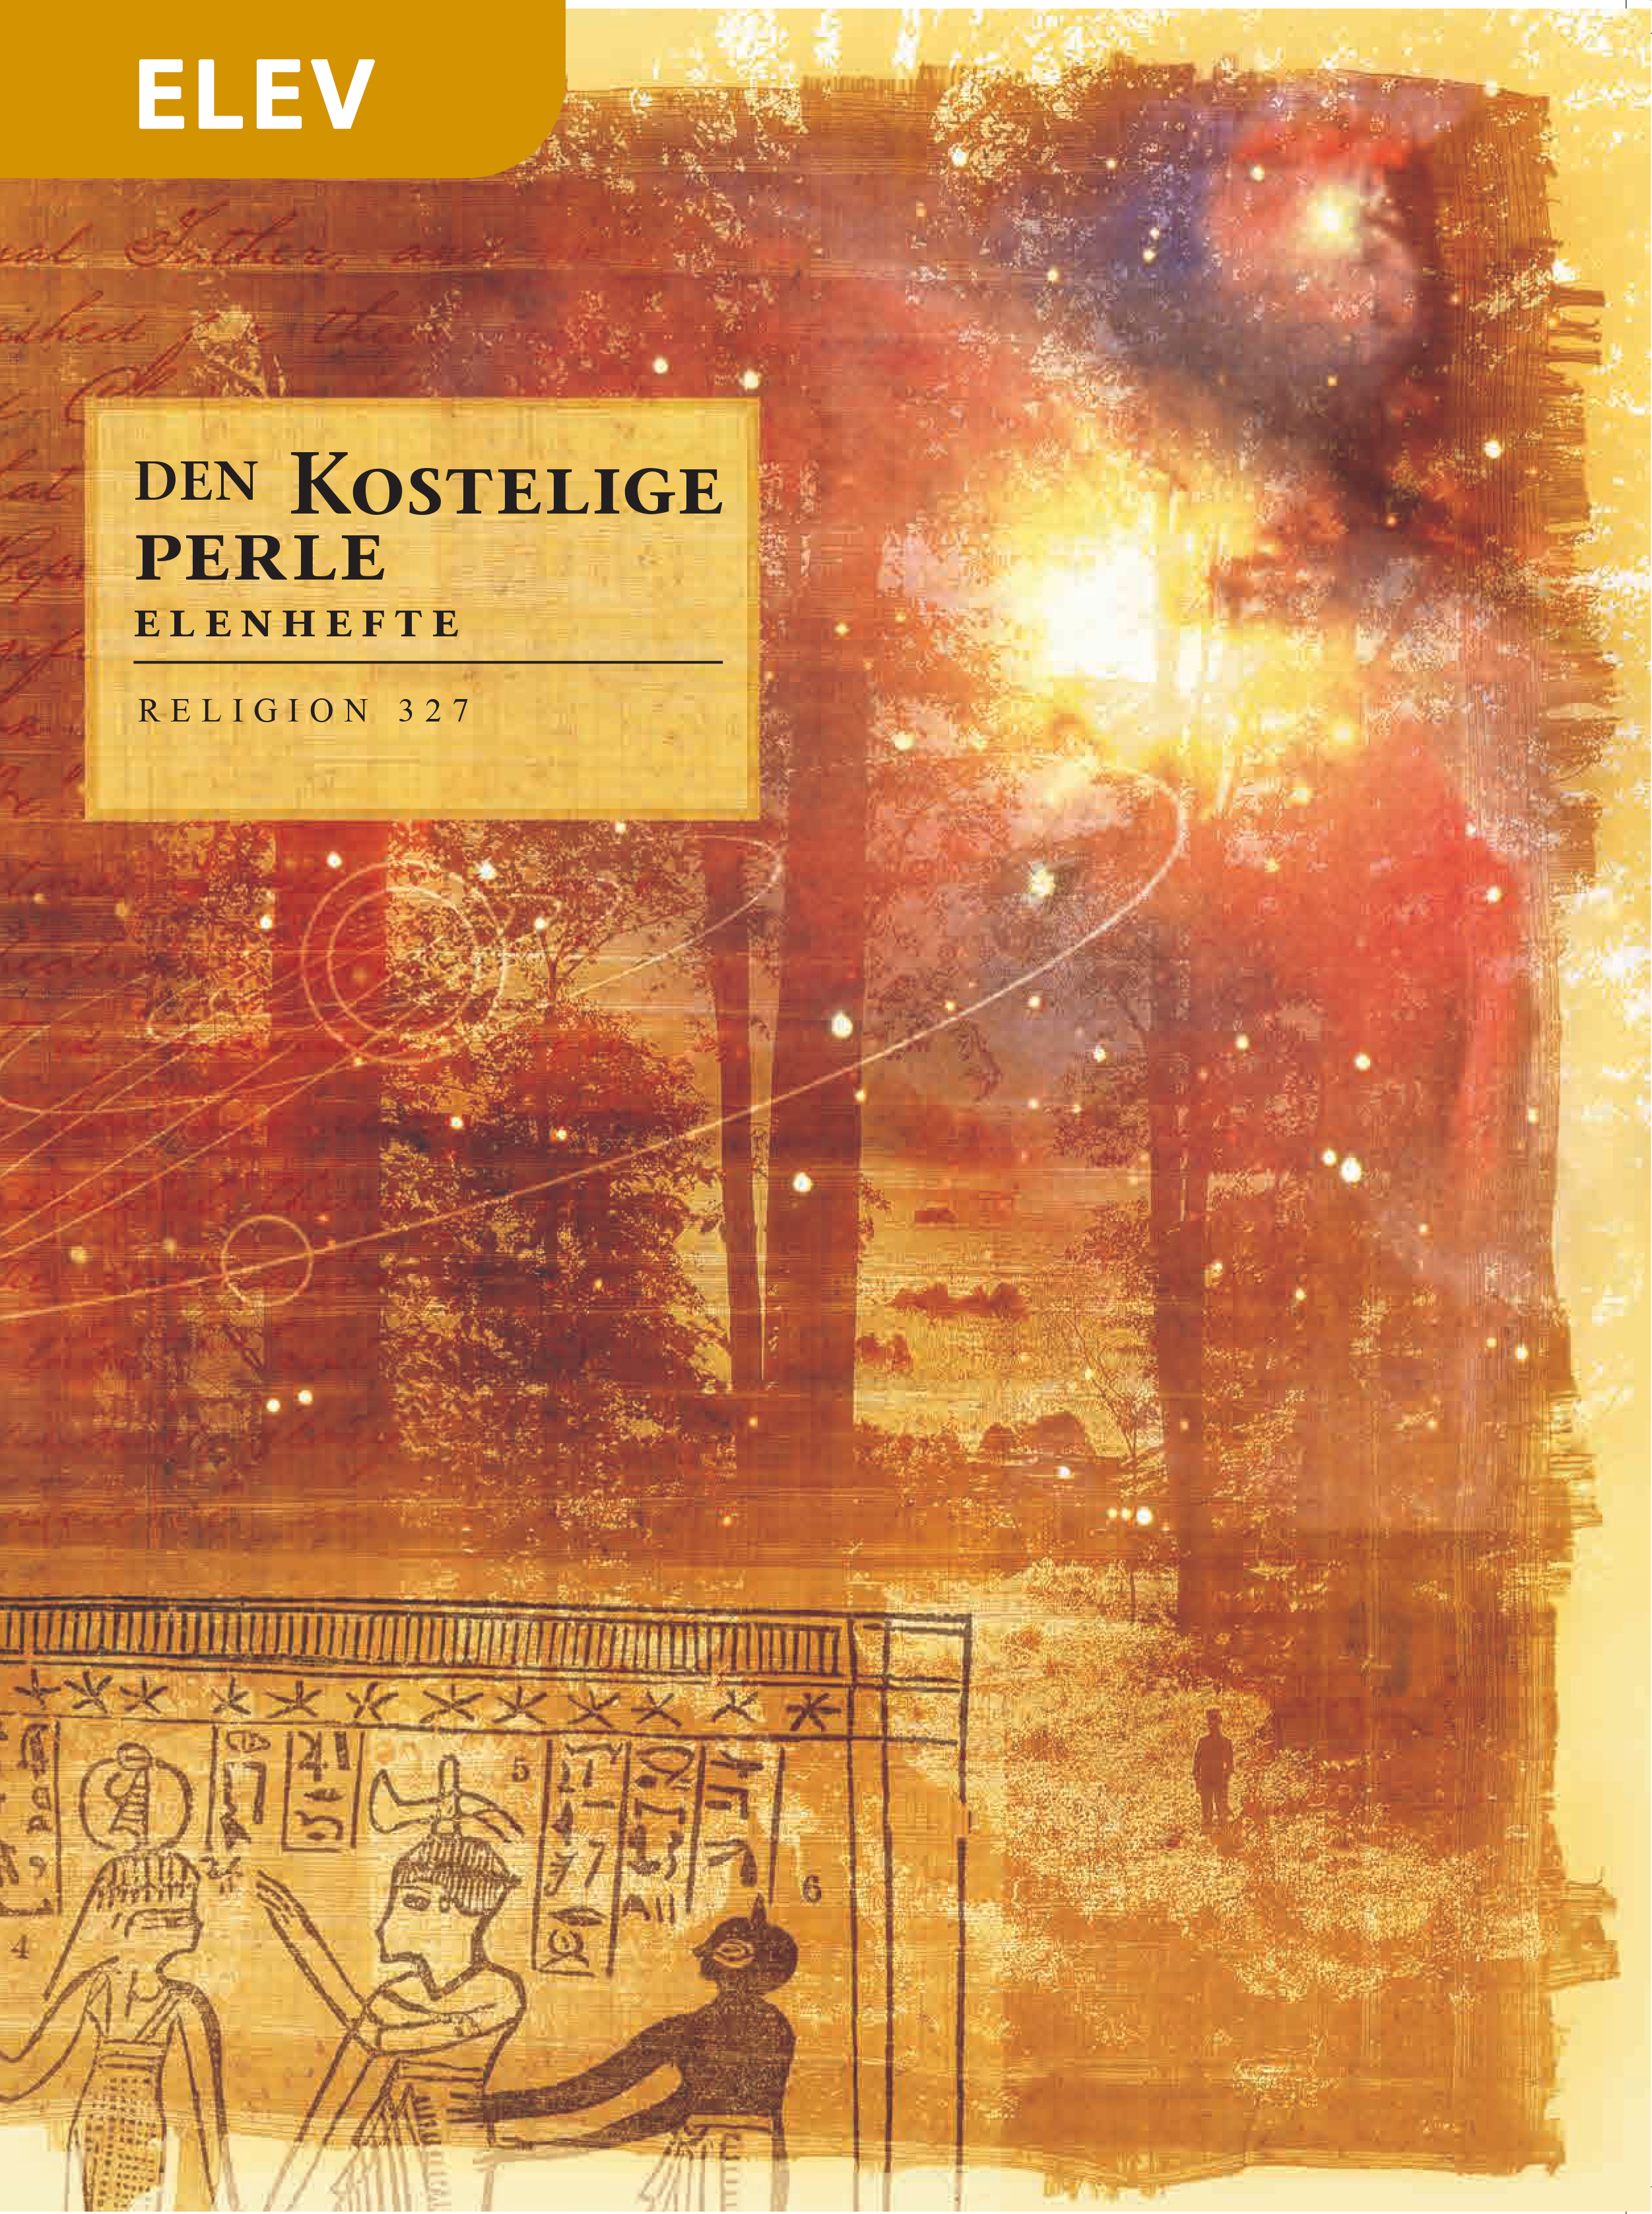 Den kostelige perle – Elevhåndbok (Religion 327)